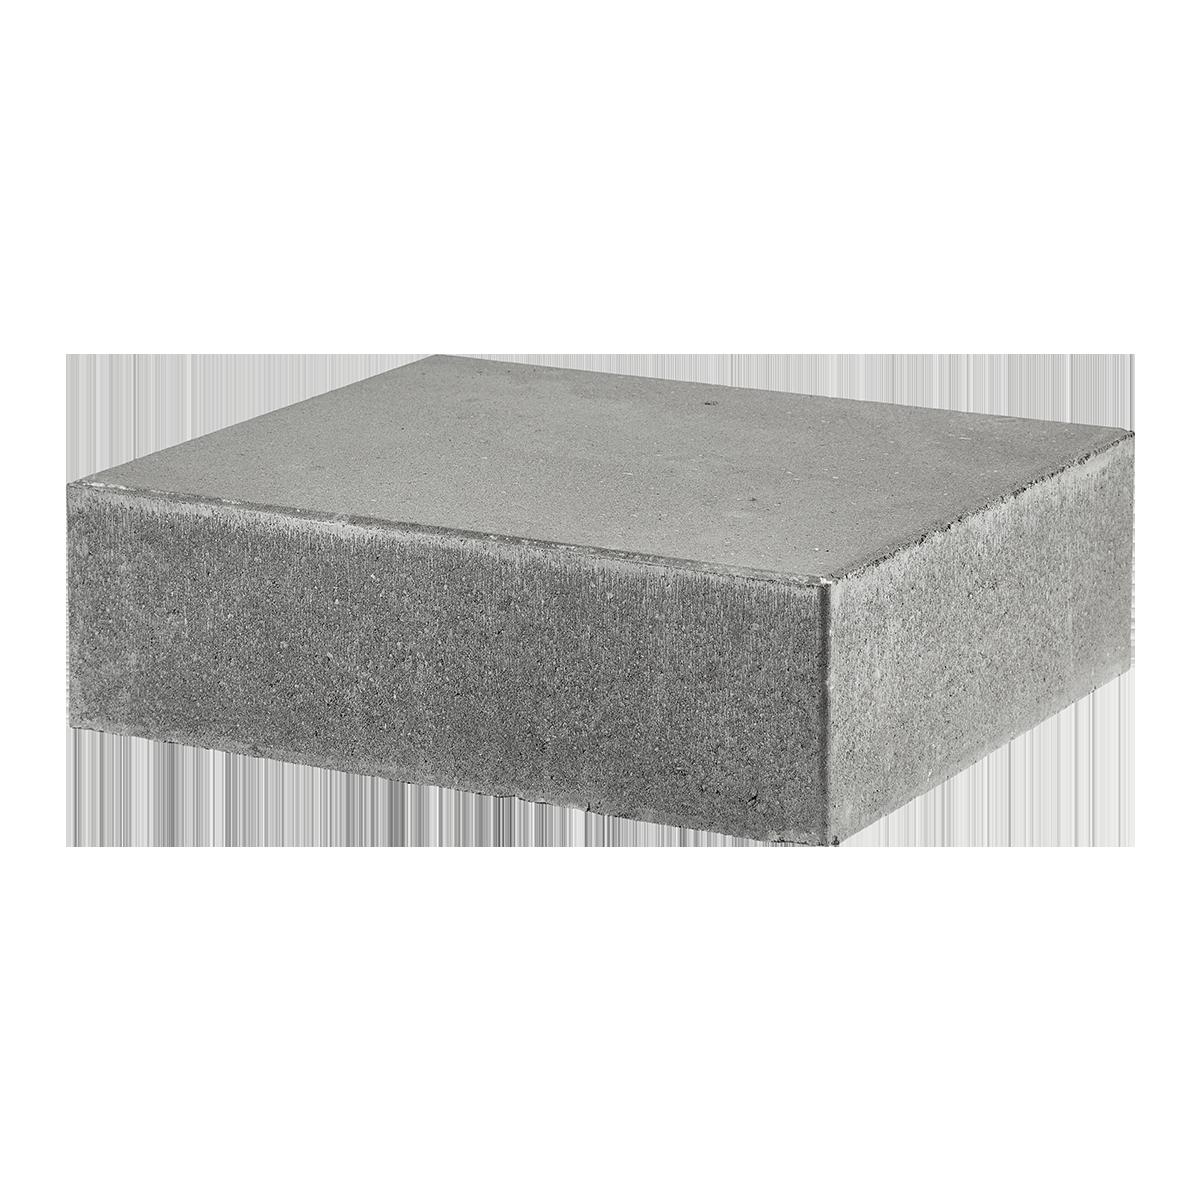 Trappetrin 50x40x15 cm Grå Lige kant